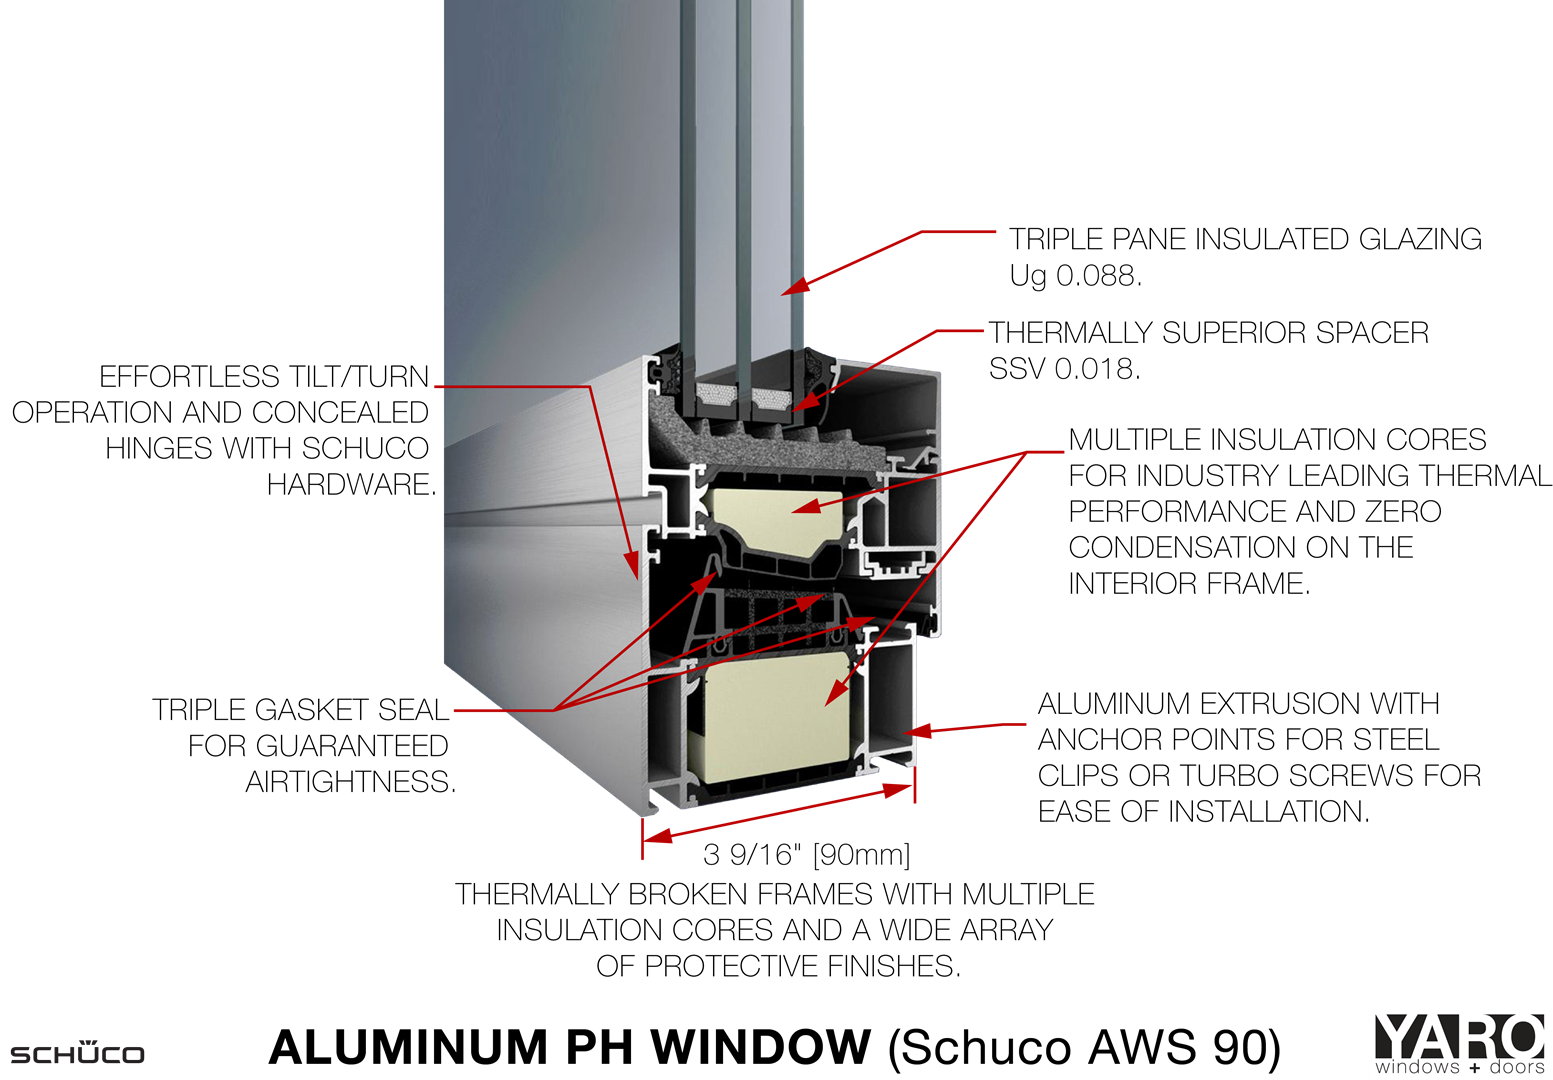 Yaro Windows + Doors   Aluminum Products